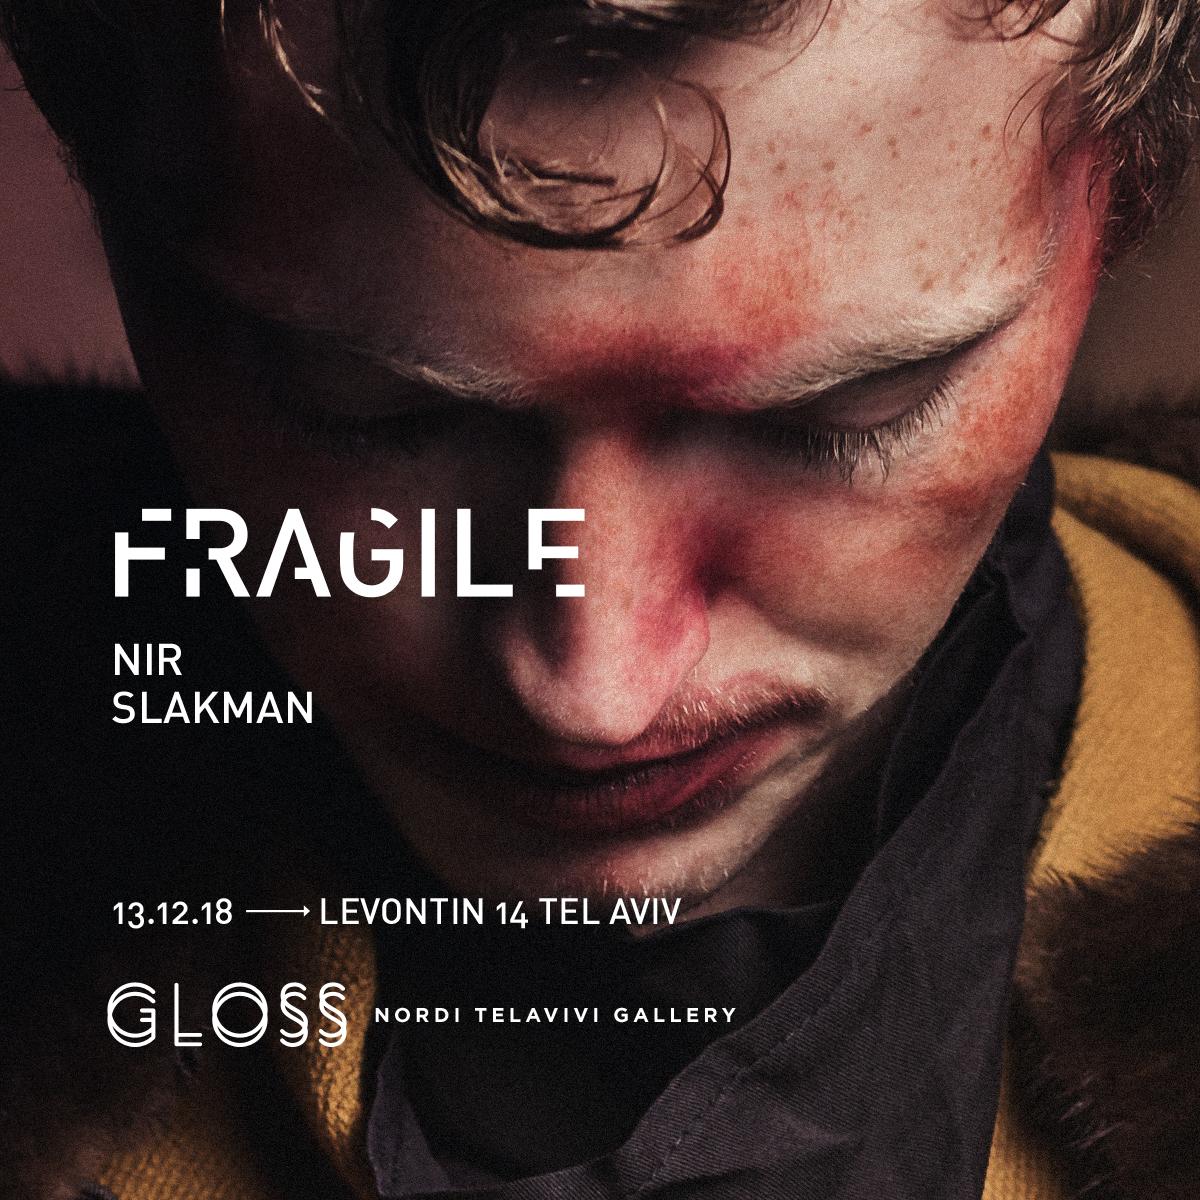 Nir Slakman for Gloss Gallery